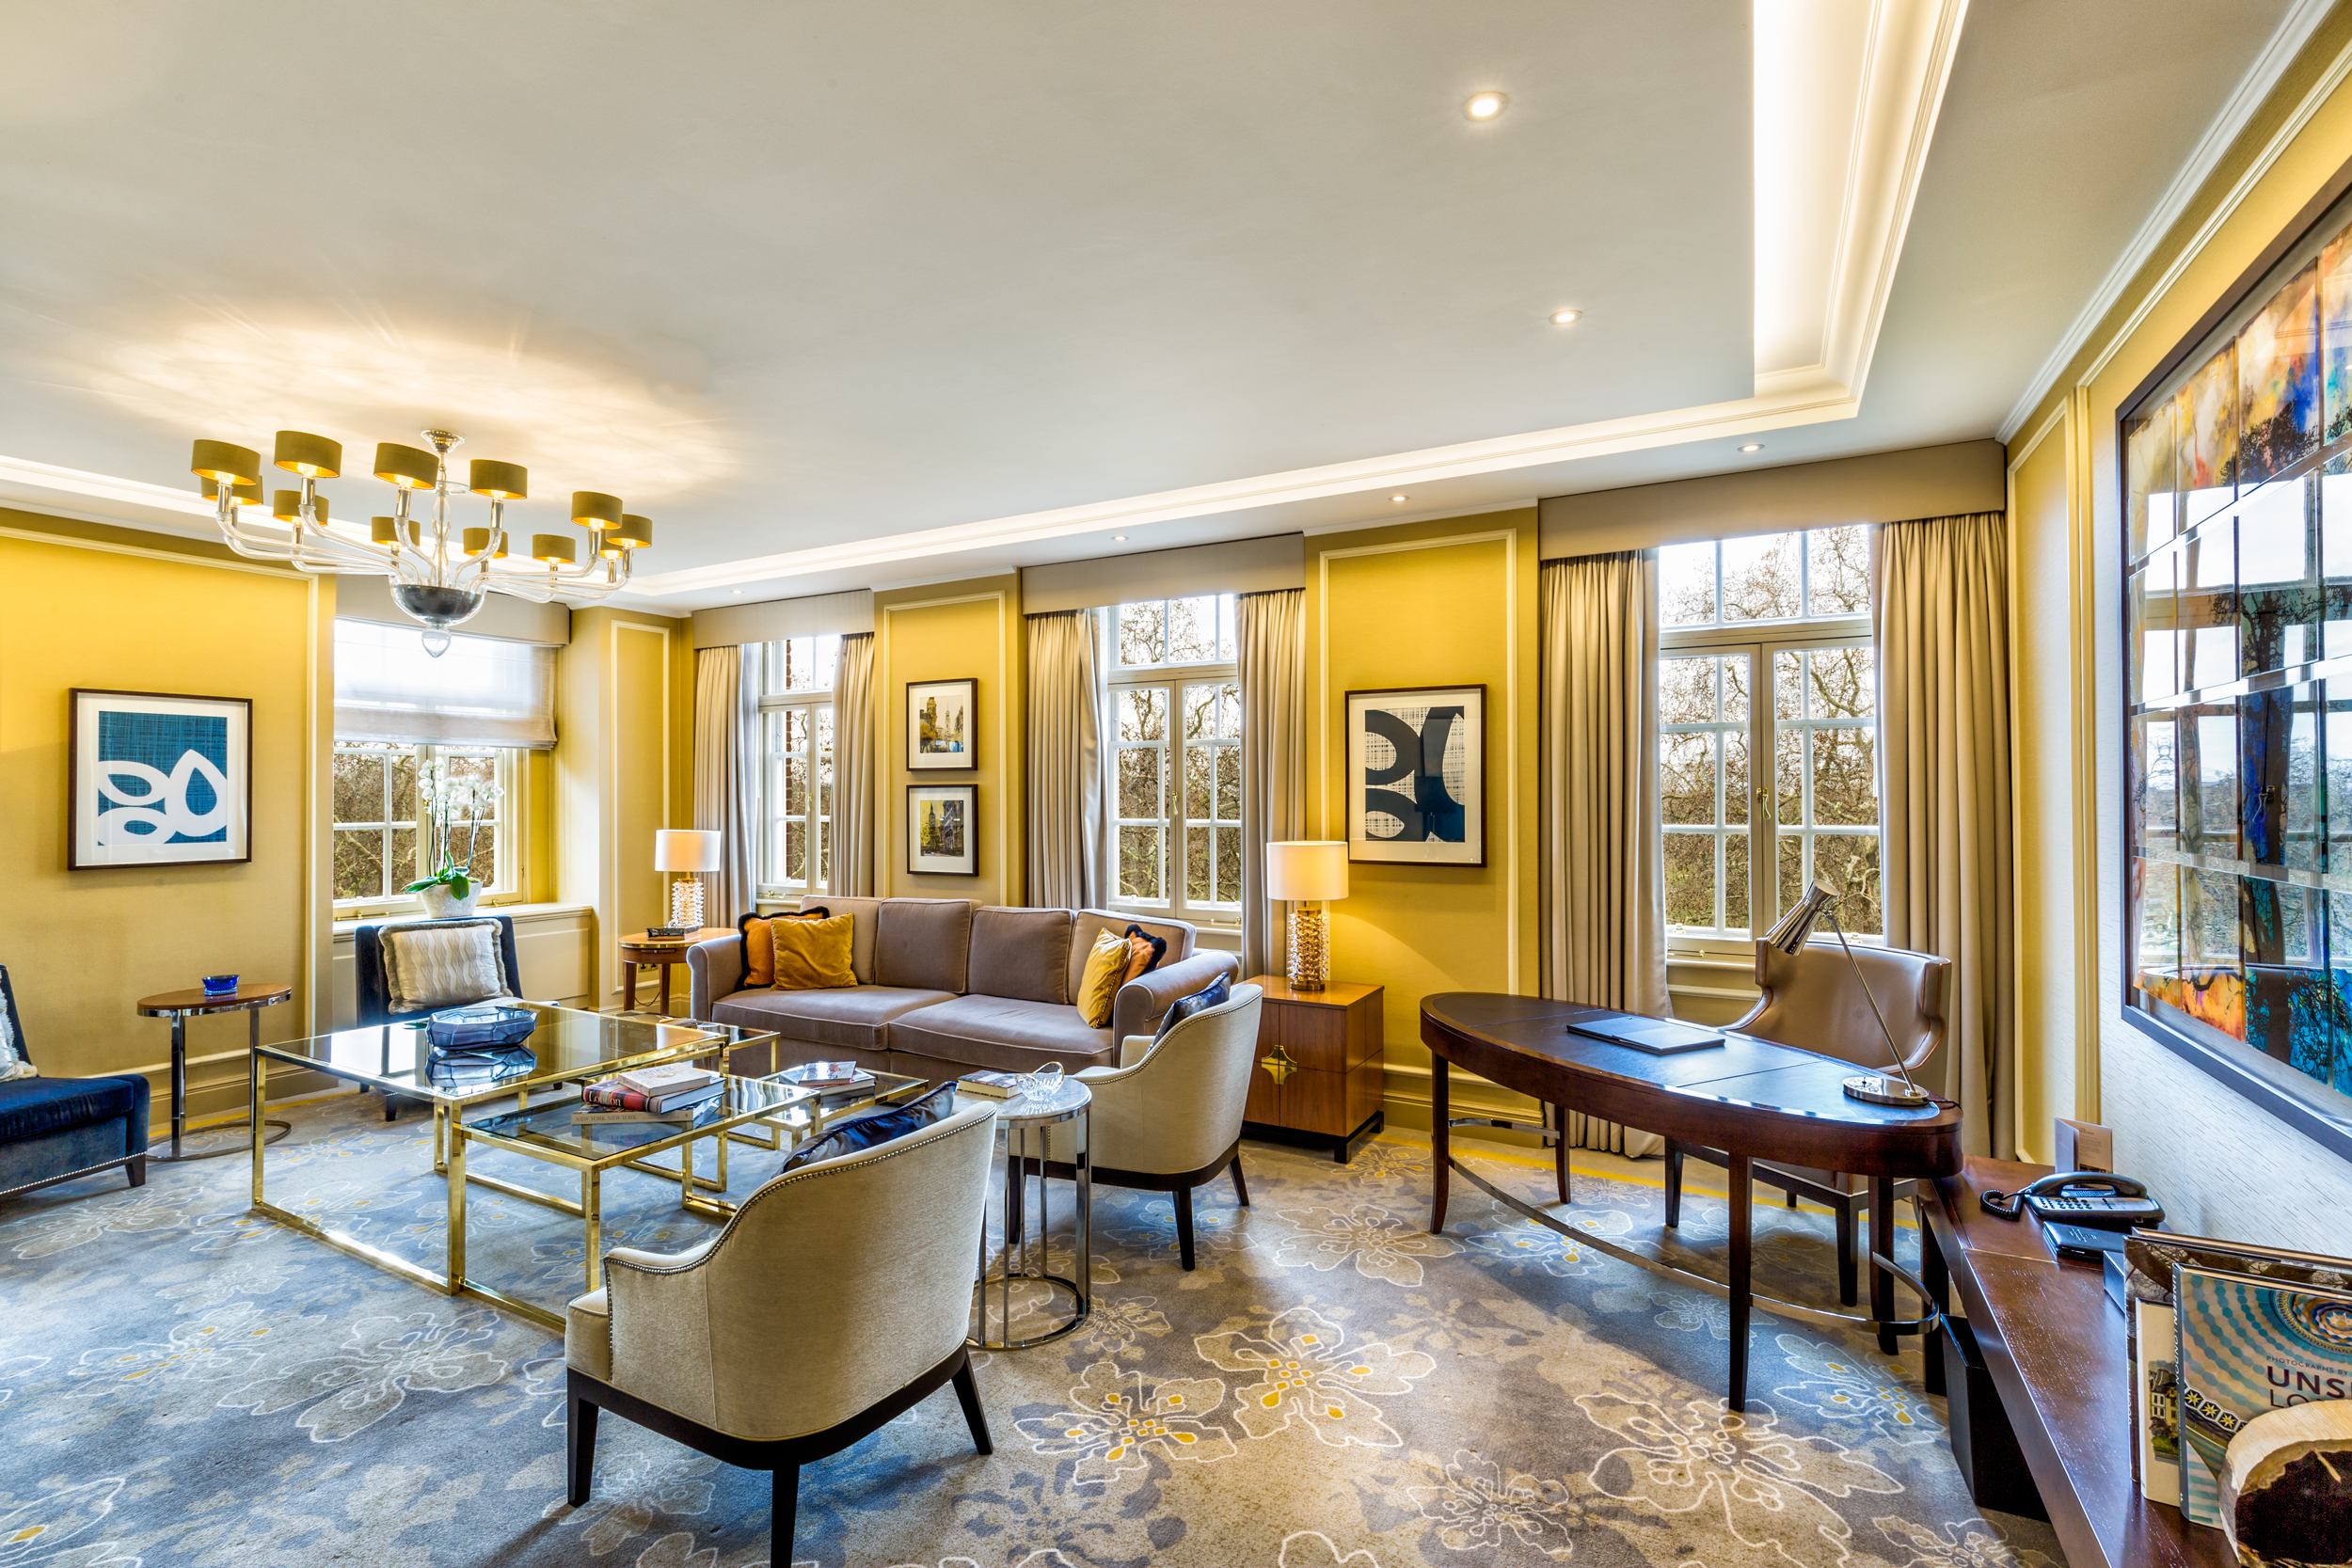 Luxury Hotel and interior photographer